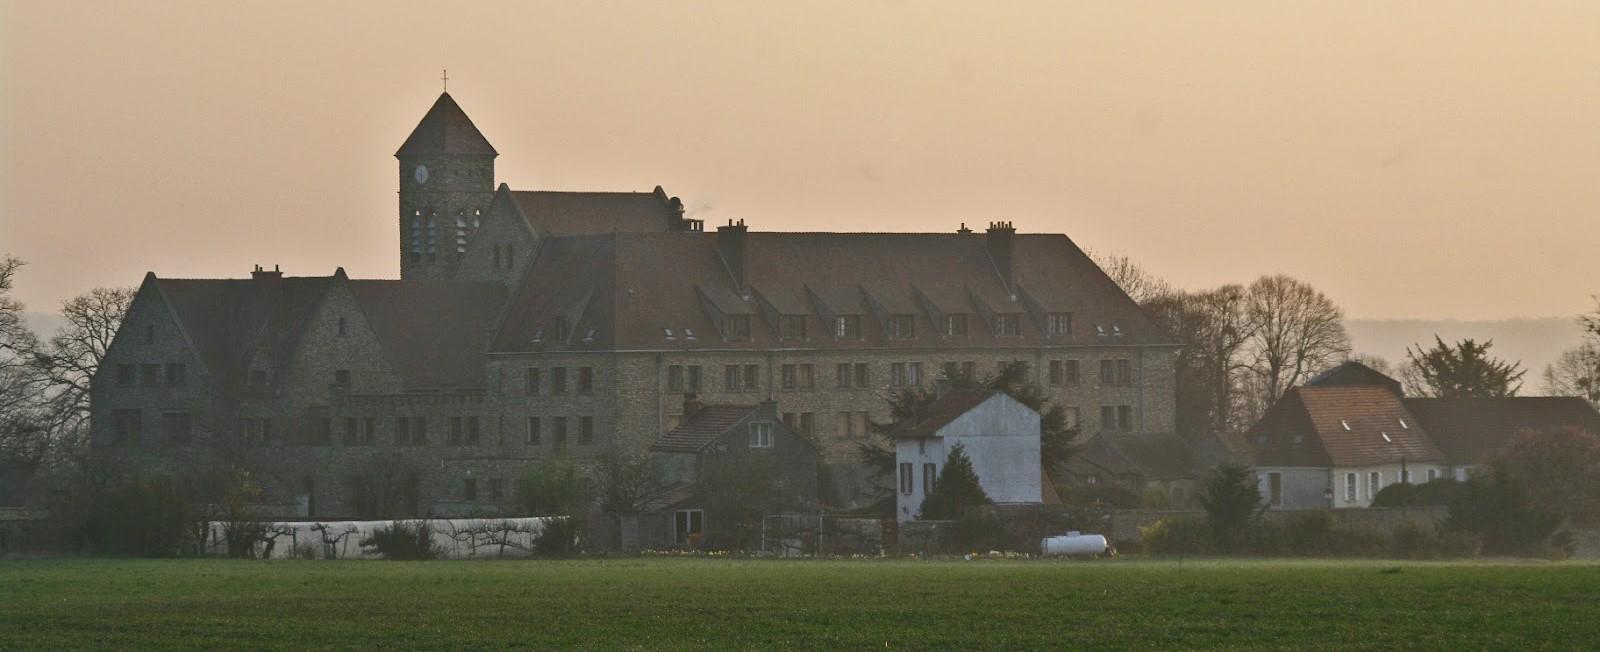 Abbaye de Limon, Vauhallan